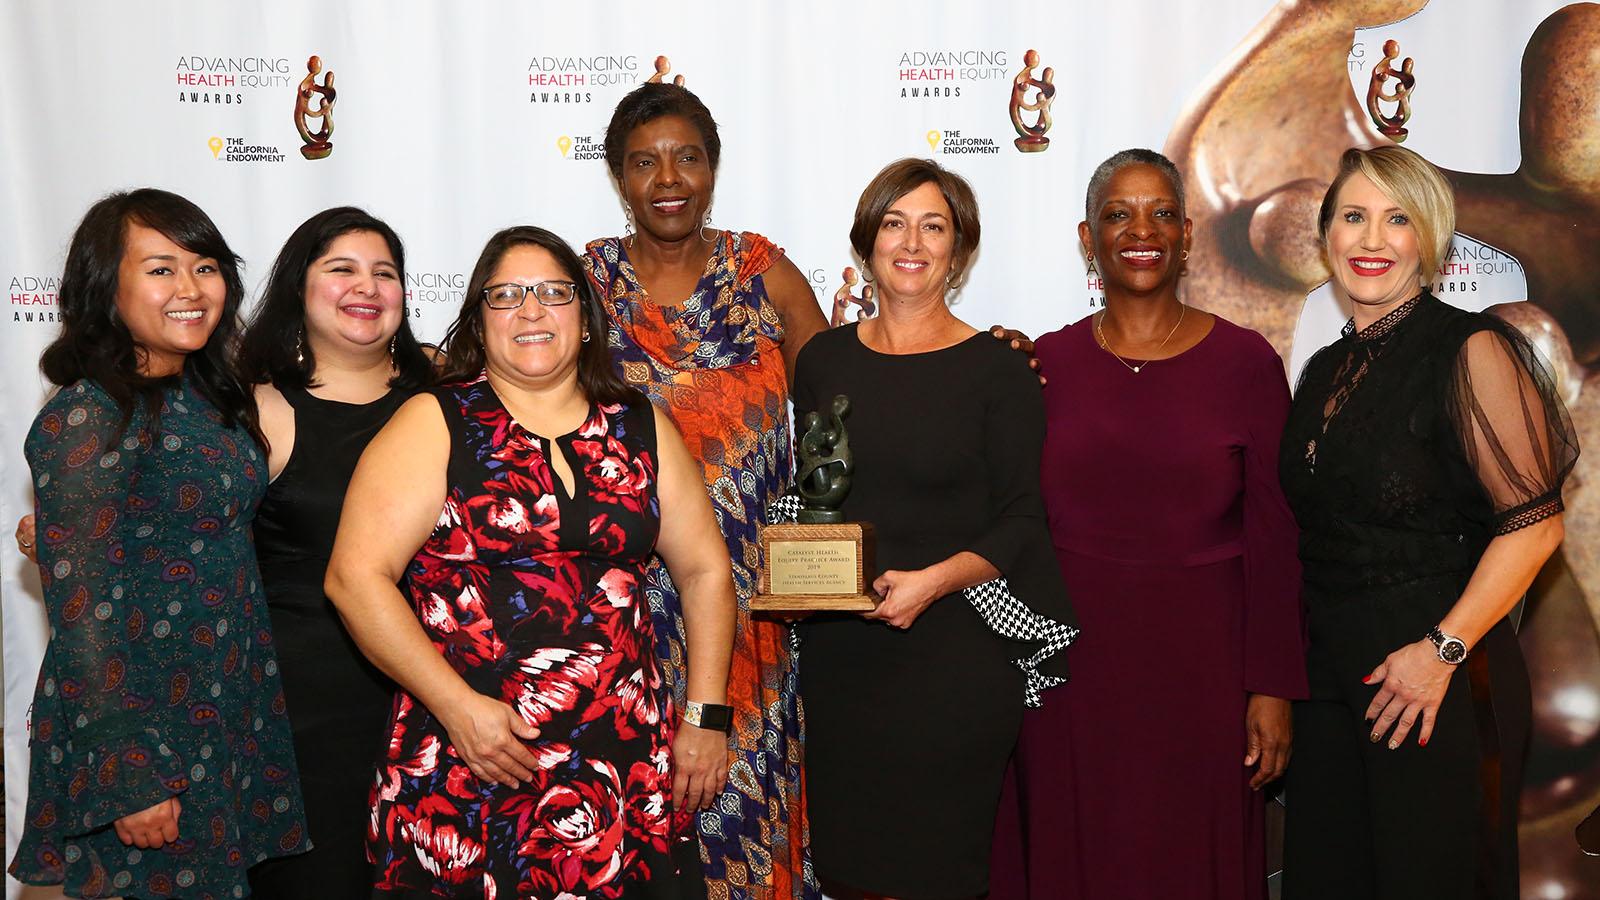 Stanislaus County - 2019 Awardee